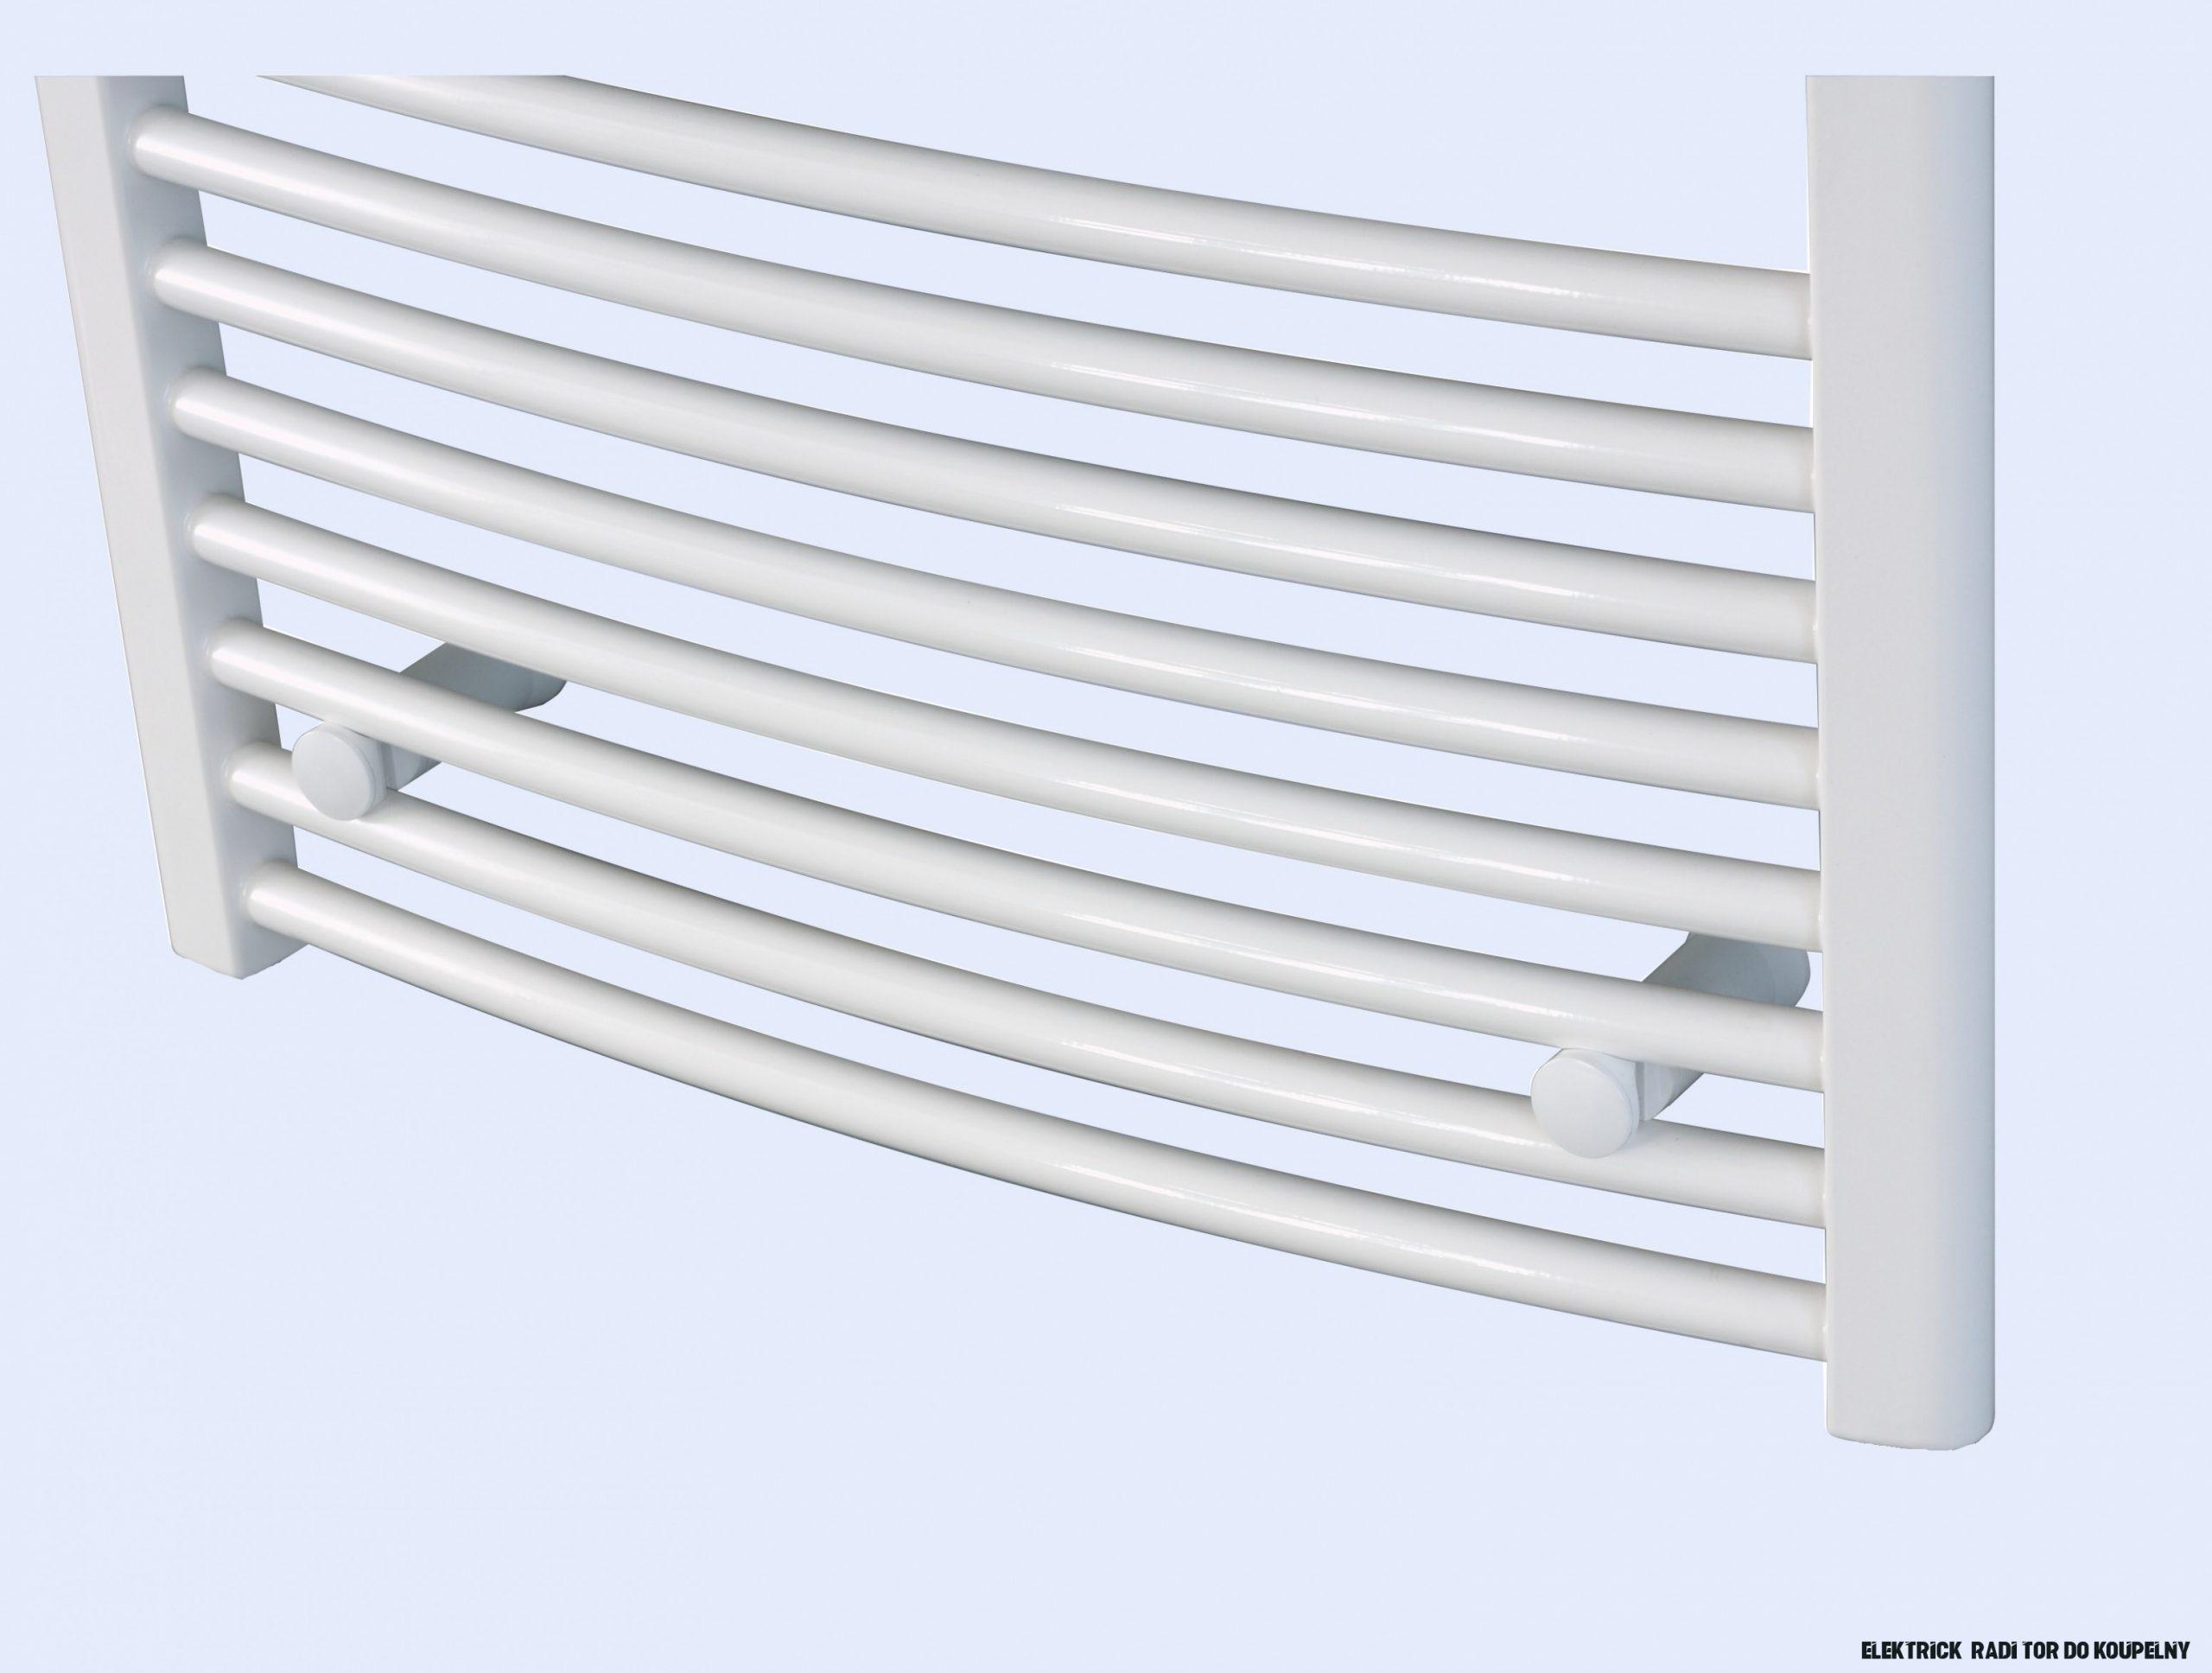 → Elektrický radiátor do koupelny Neriet PRIMO RONDO s